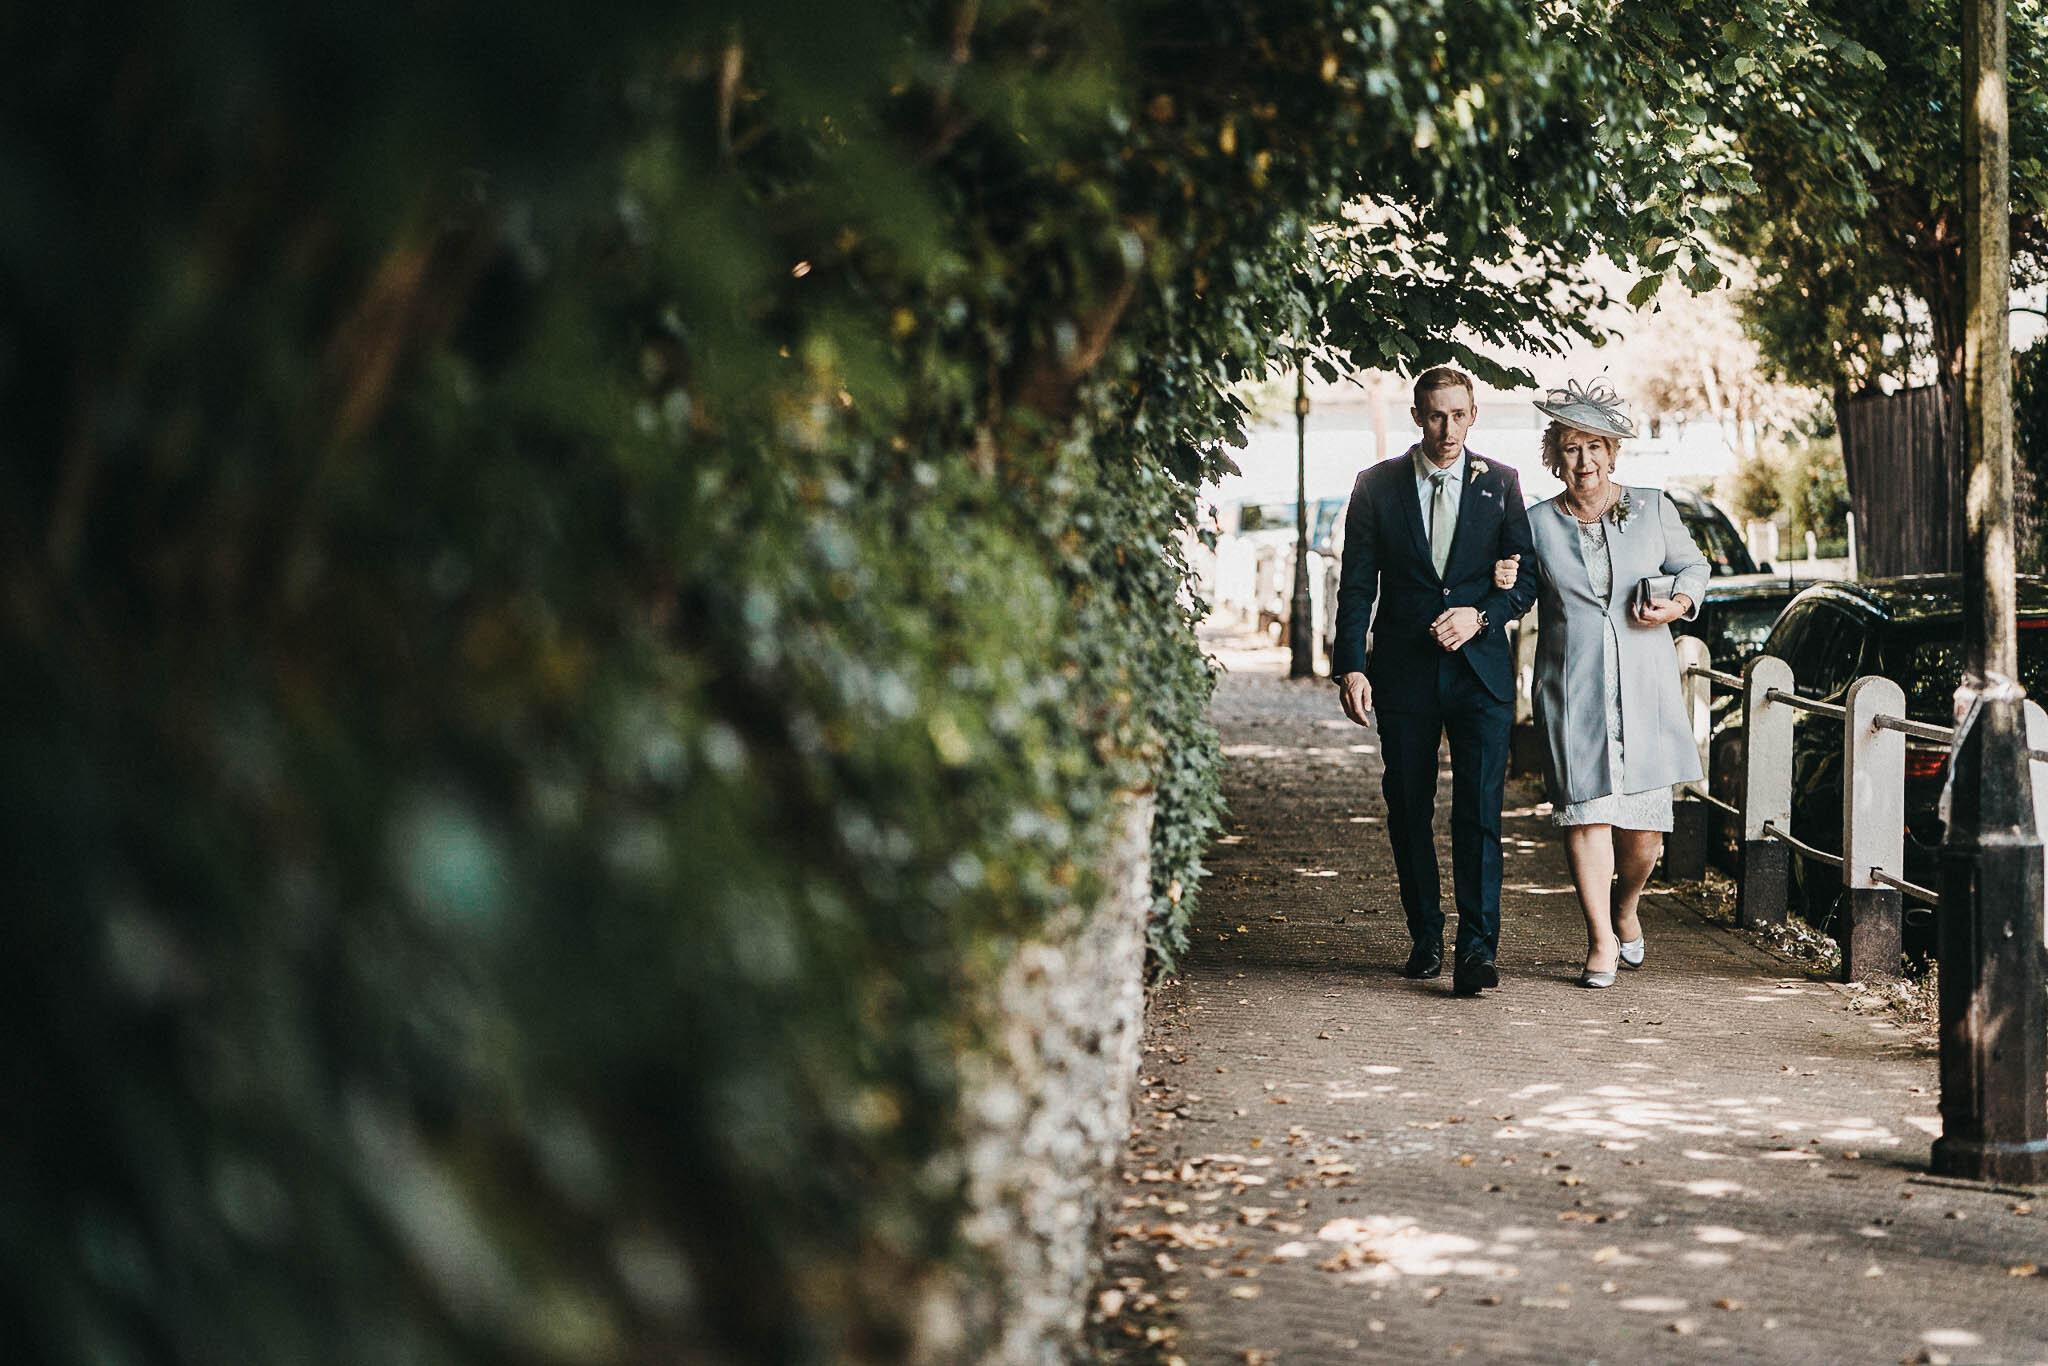 family-walking-to-church